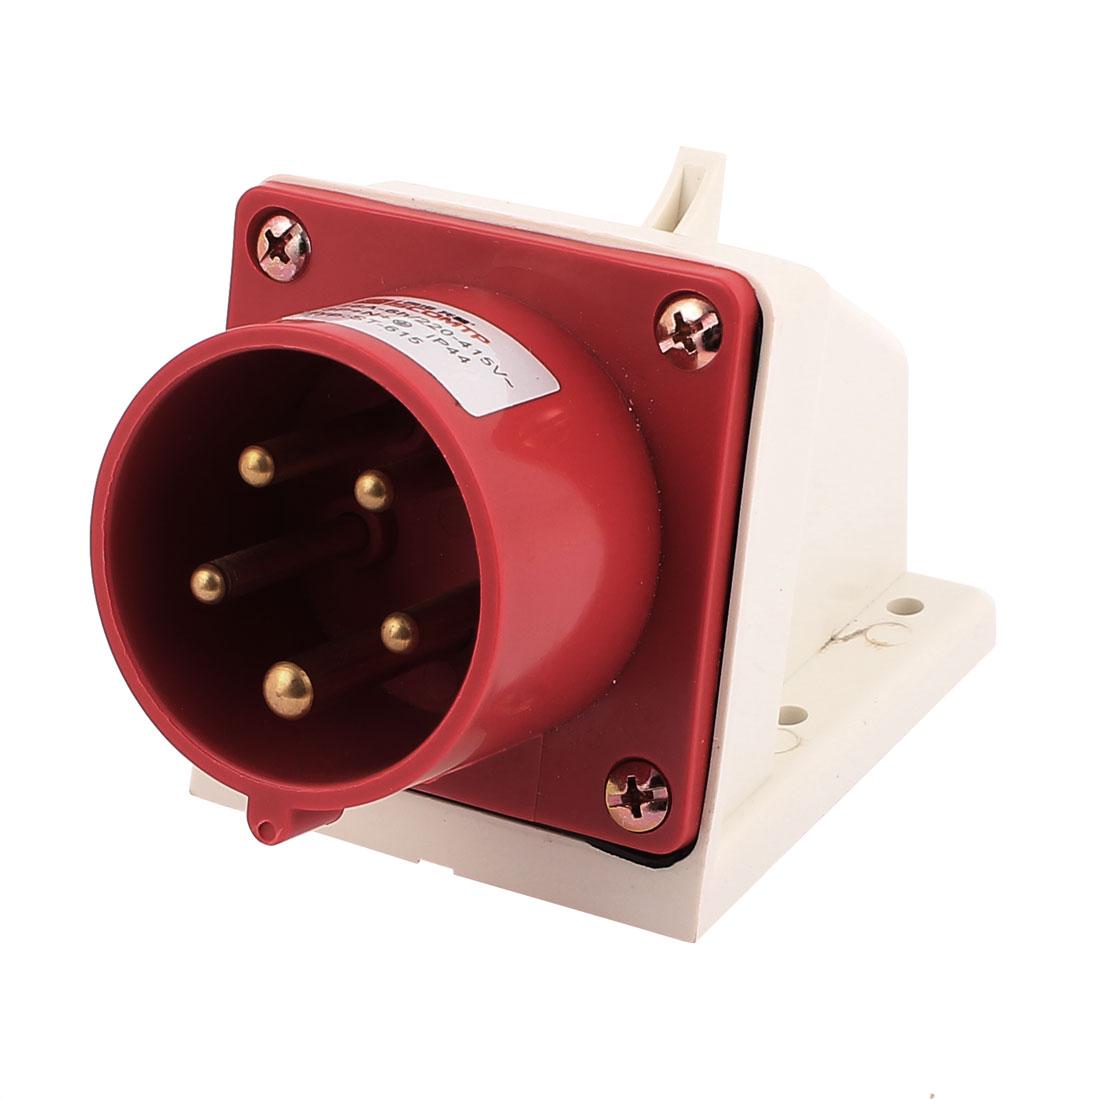 AC 220V-415V 16A IP44 3P+N+E 5-Terminal Male Industrial Caravan Panel Plug